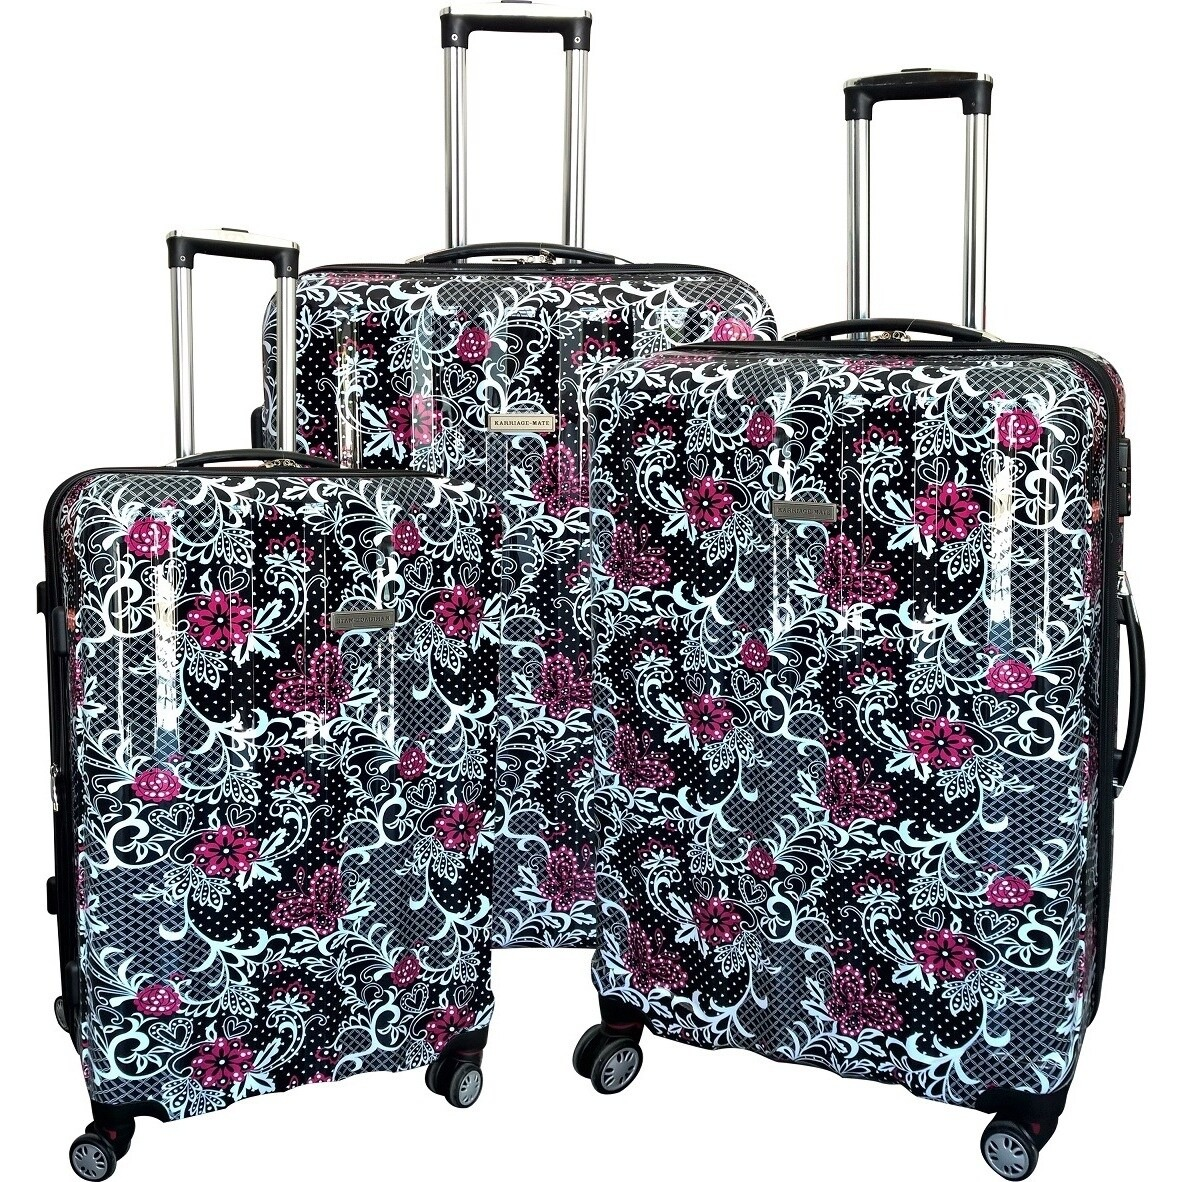 "Karriage-Mate Floral Multicolor 3-piece Hardside Spinner Luggage Set - 17"""